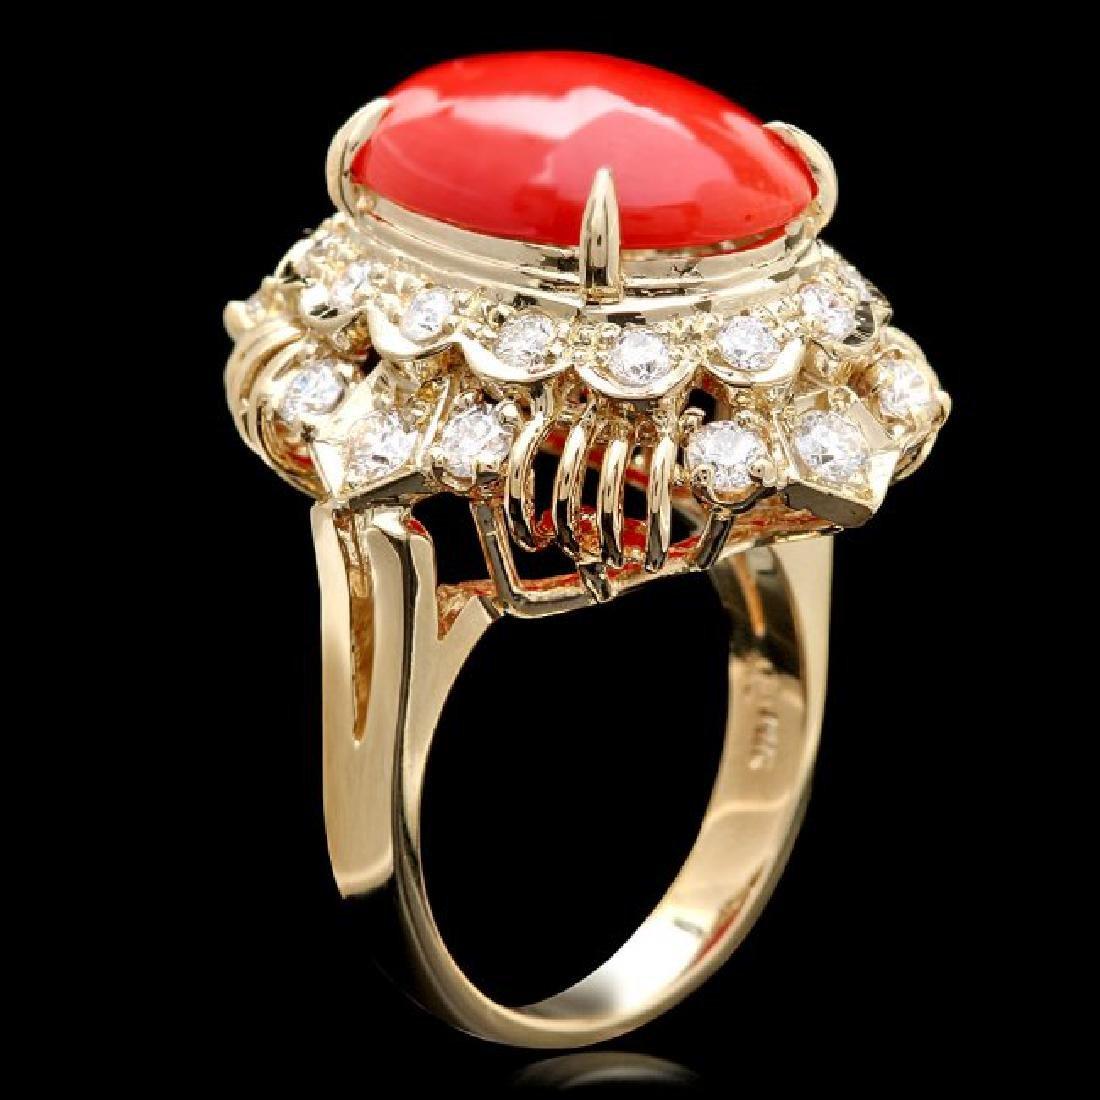 14k Yellow Gold 4.50ct Coral 1.30ct Diamond Ring - 3